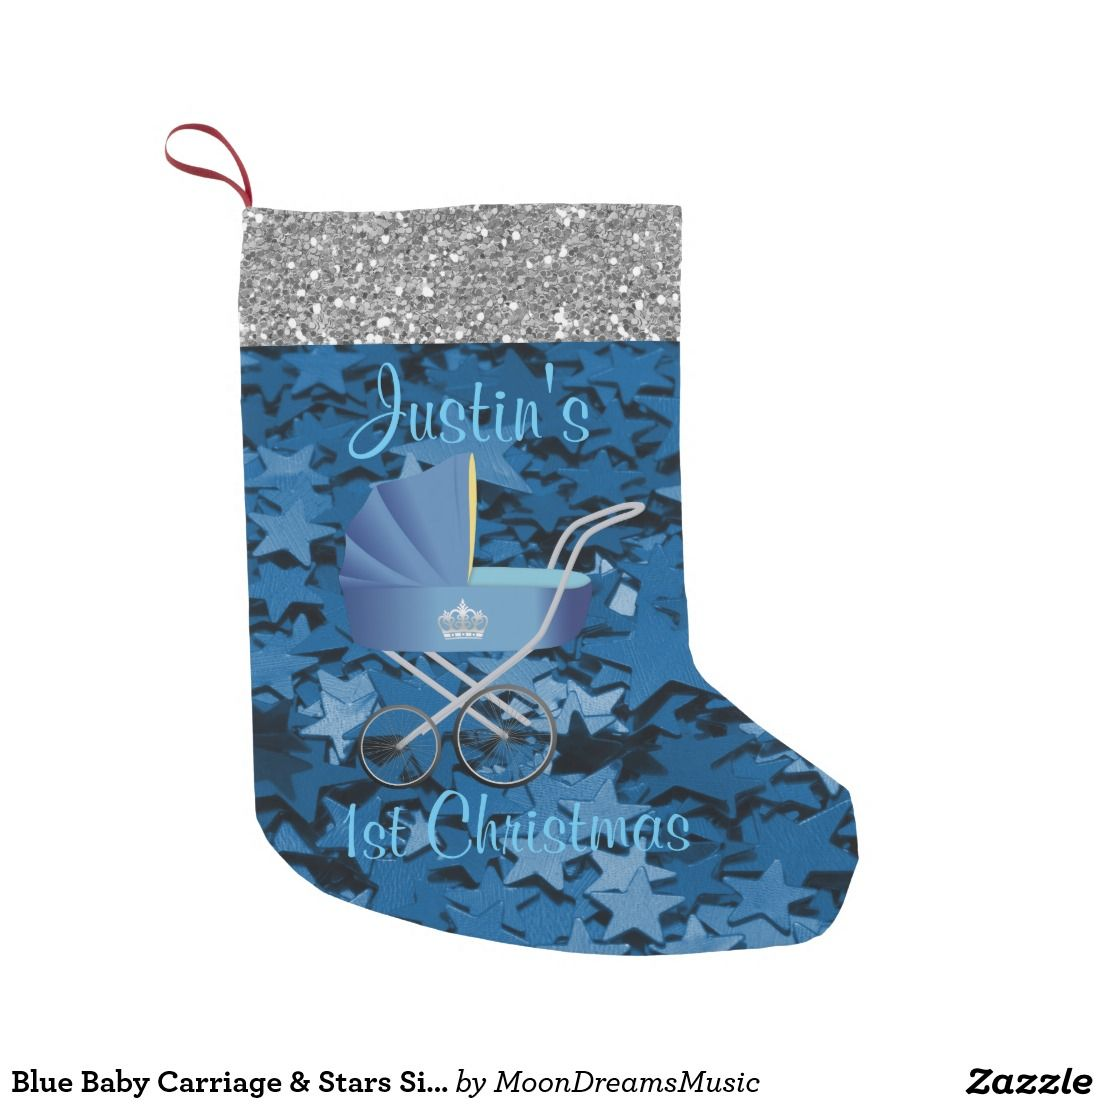 #BlueBabyCarriage & #Stars #SilverFauxGlitter #Babys1stChristmasStocking by #MoonDreamsMusic #BlueFauxGlitterStars